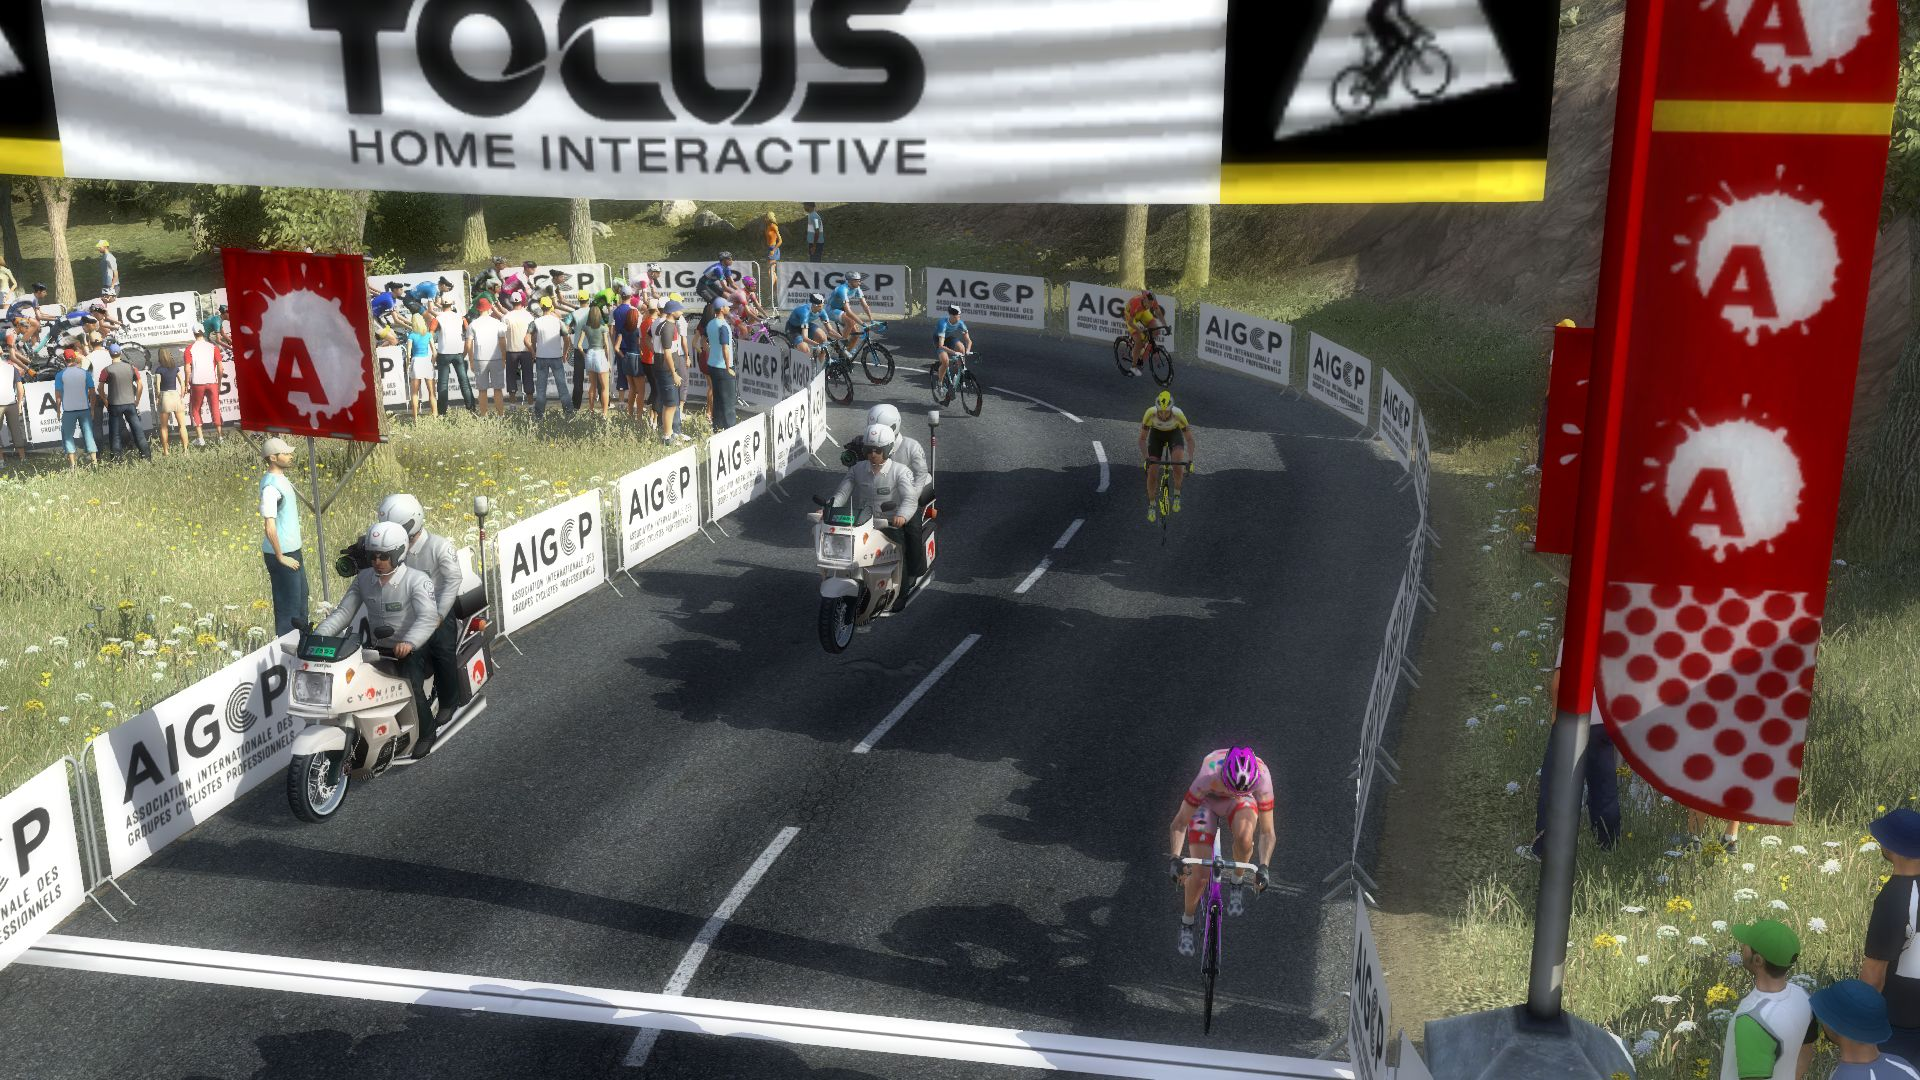 pcmdaily.com/images/mg/2019/Races/PT/Tirreno/mg19_ta_s07_04.jpg